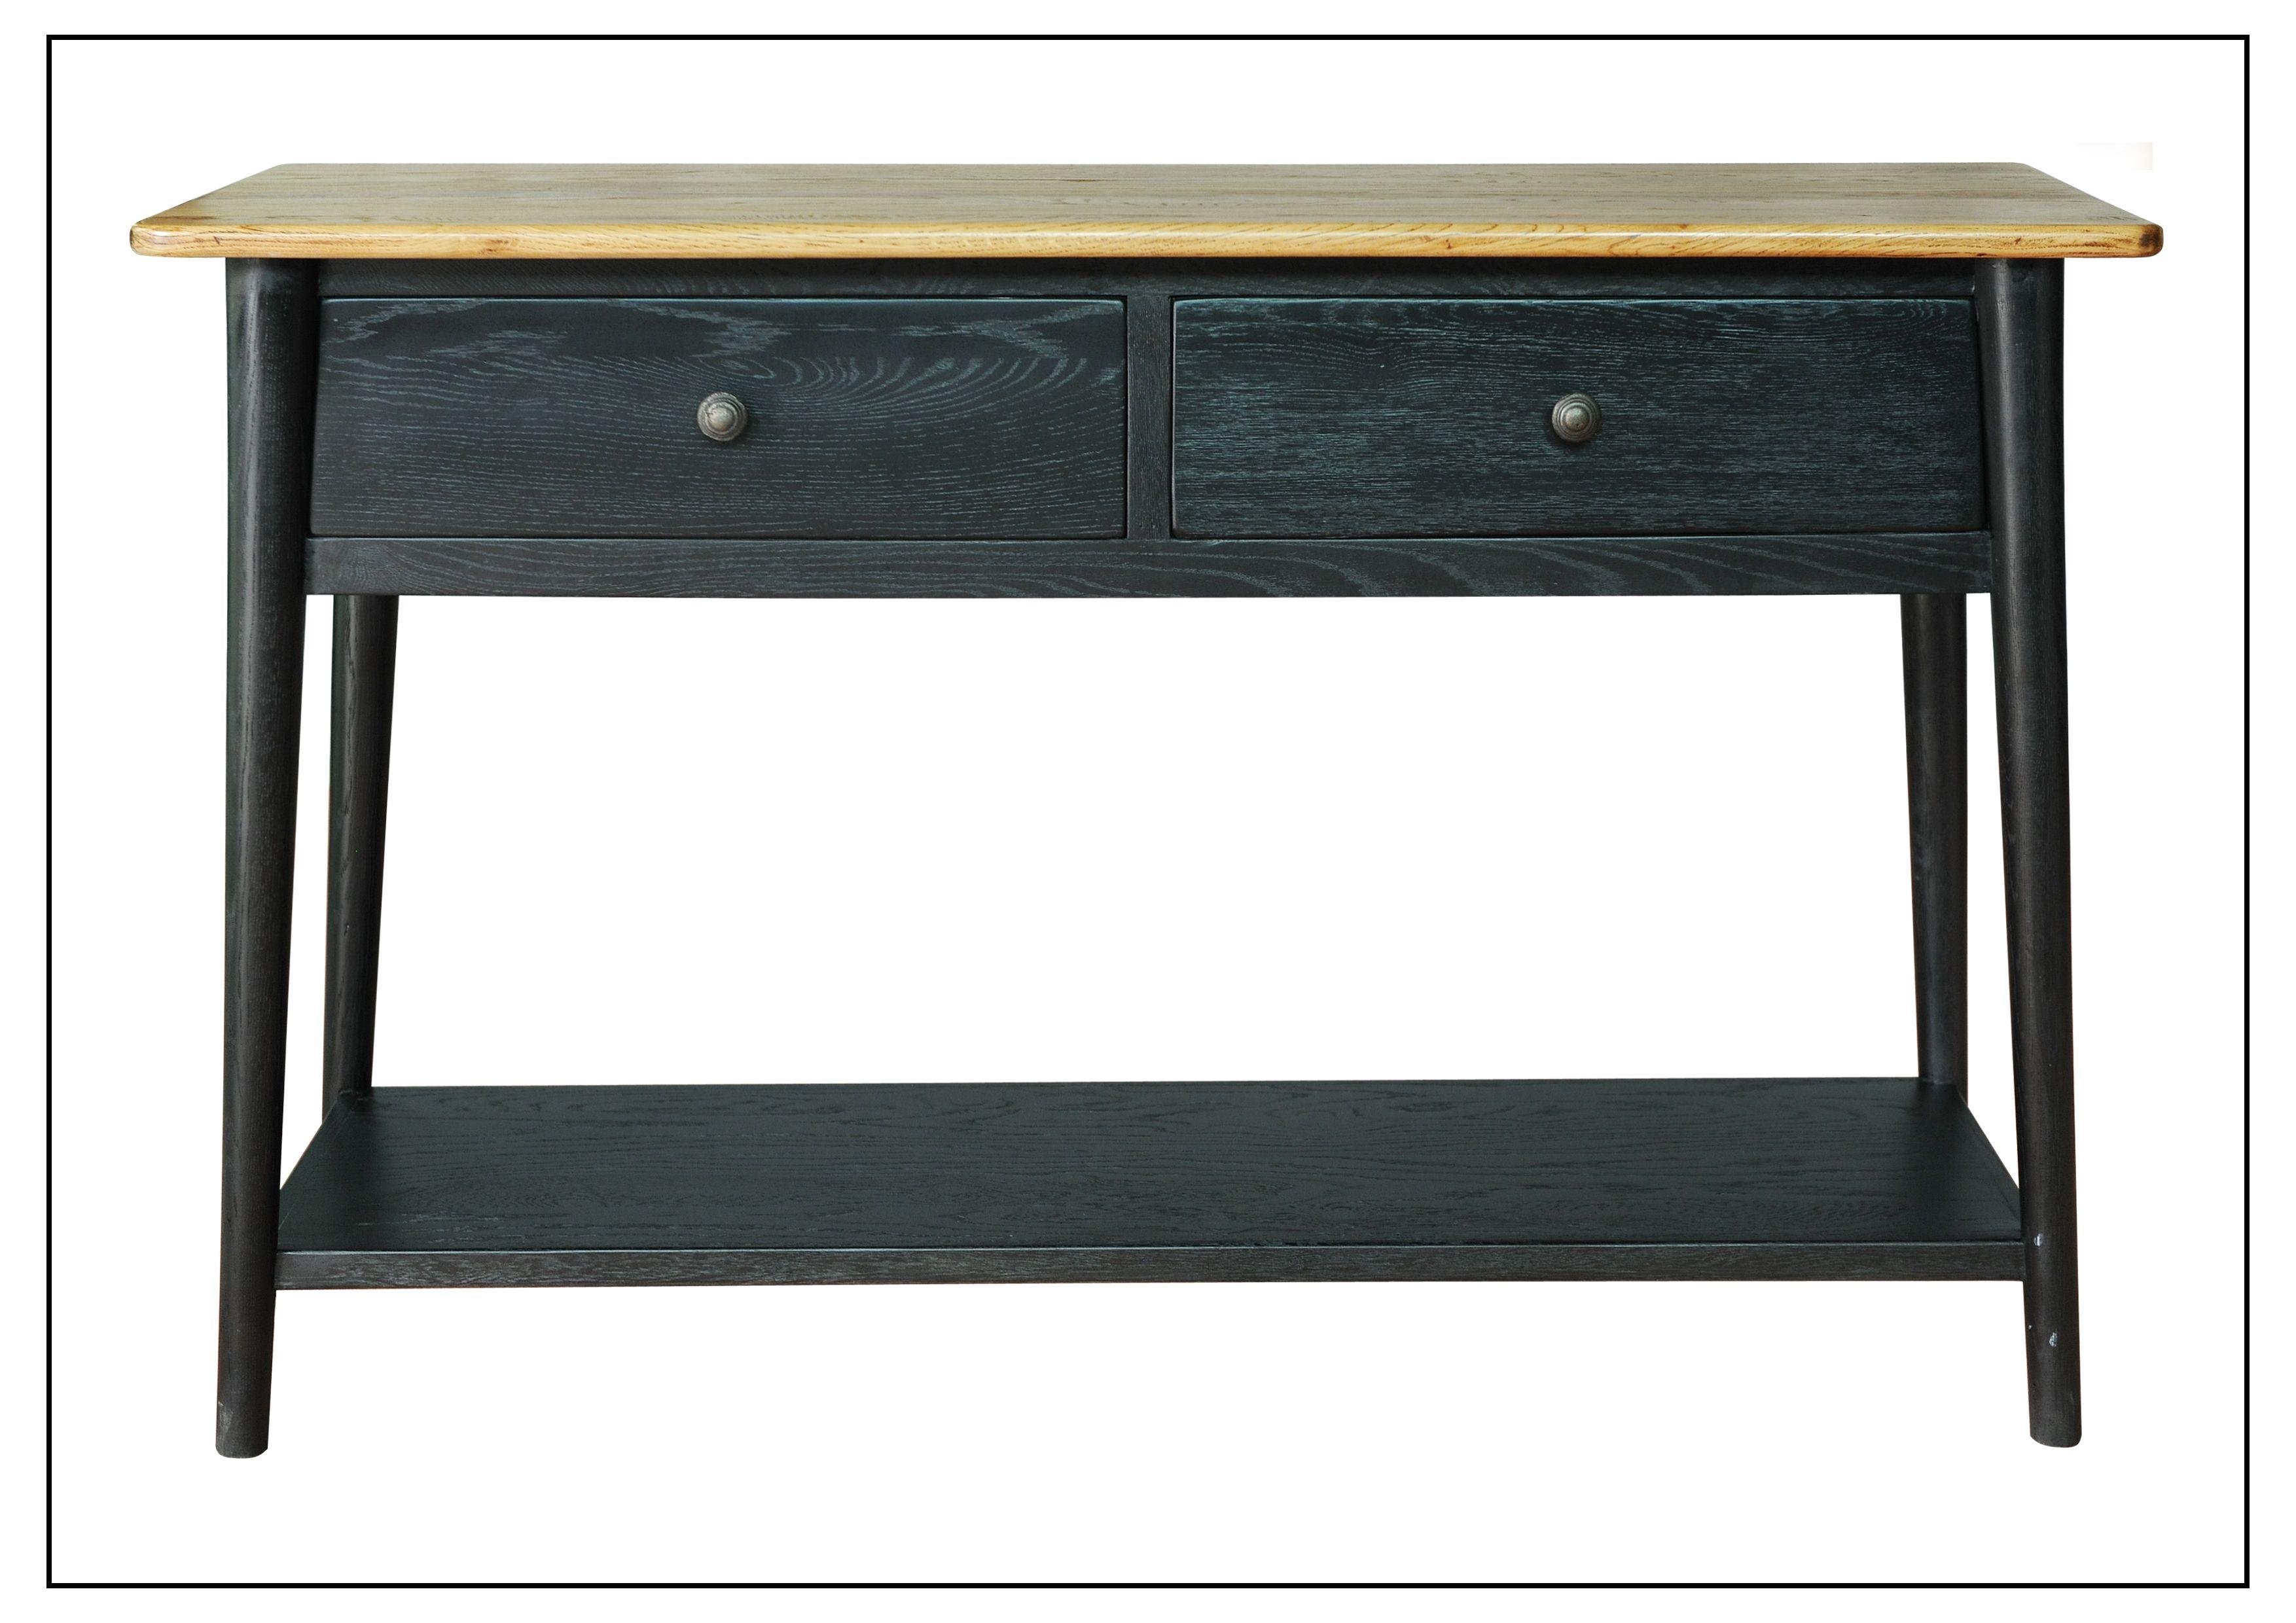 MAB-LHT007 Large Hall Table 1300mm x 400mm x 850mm High